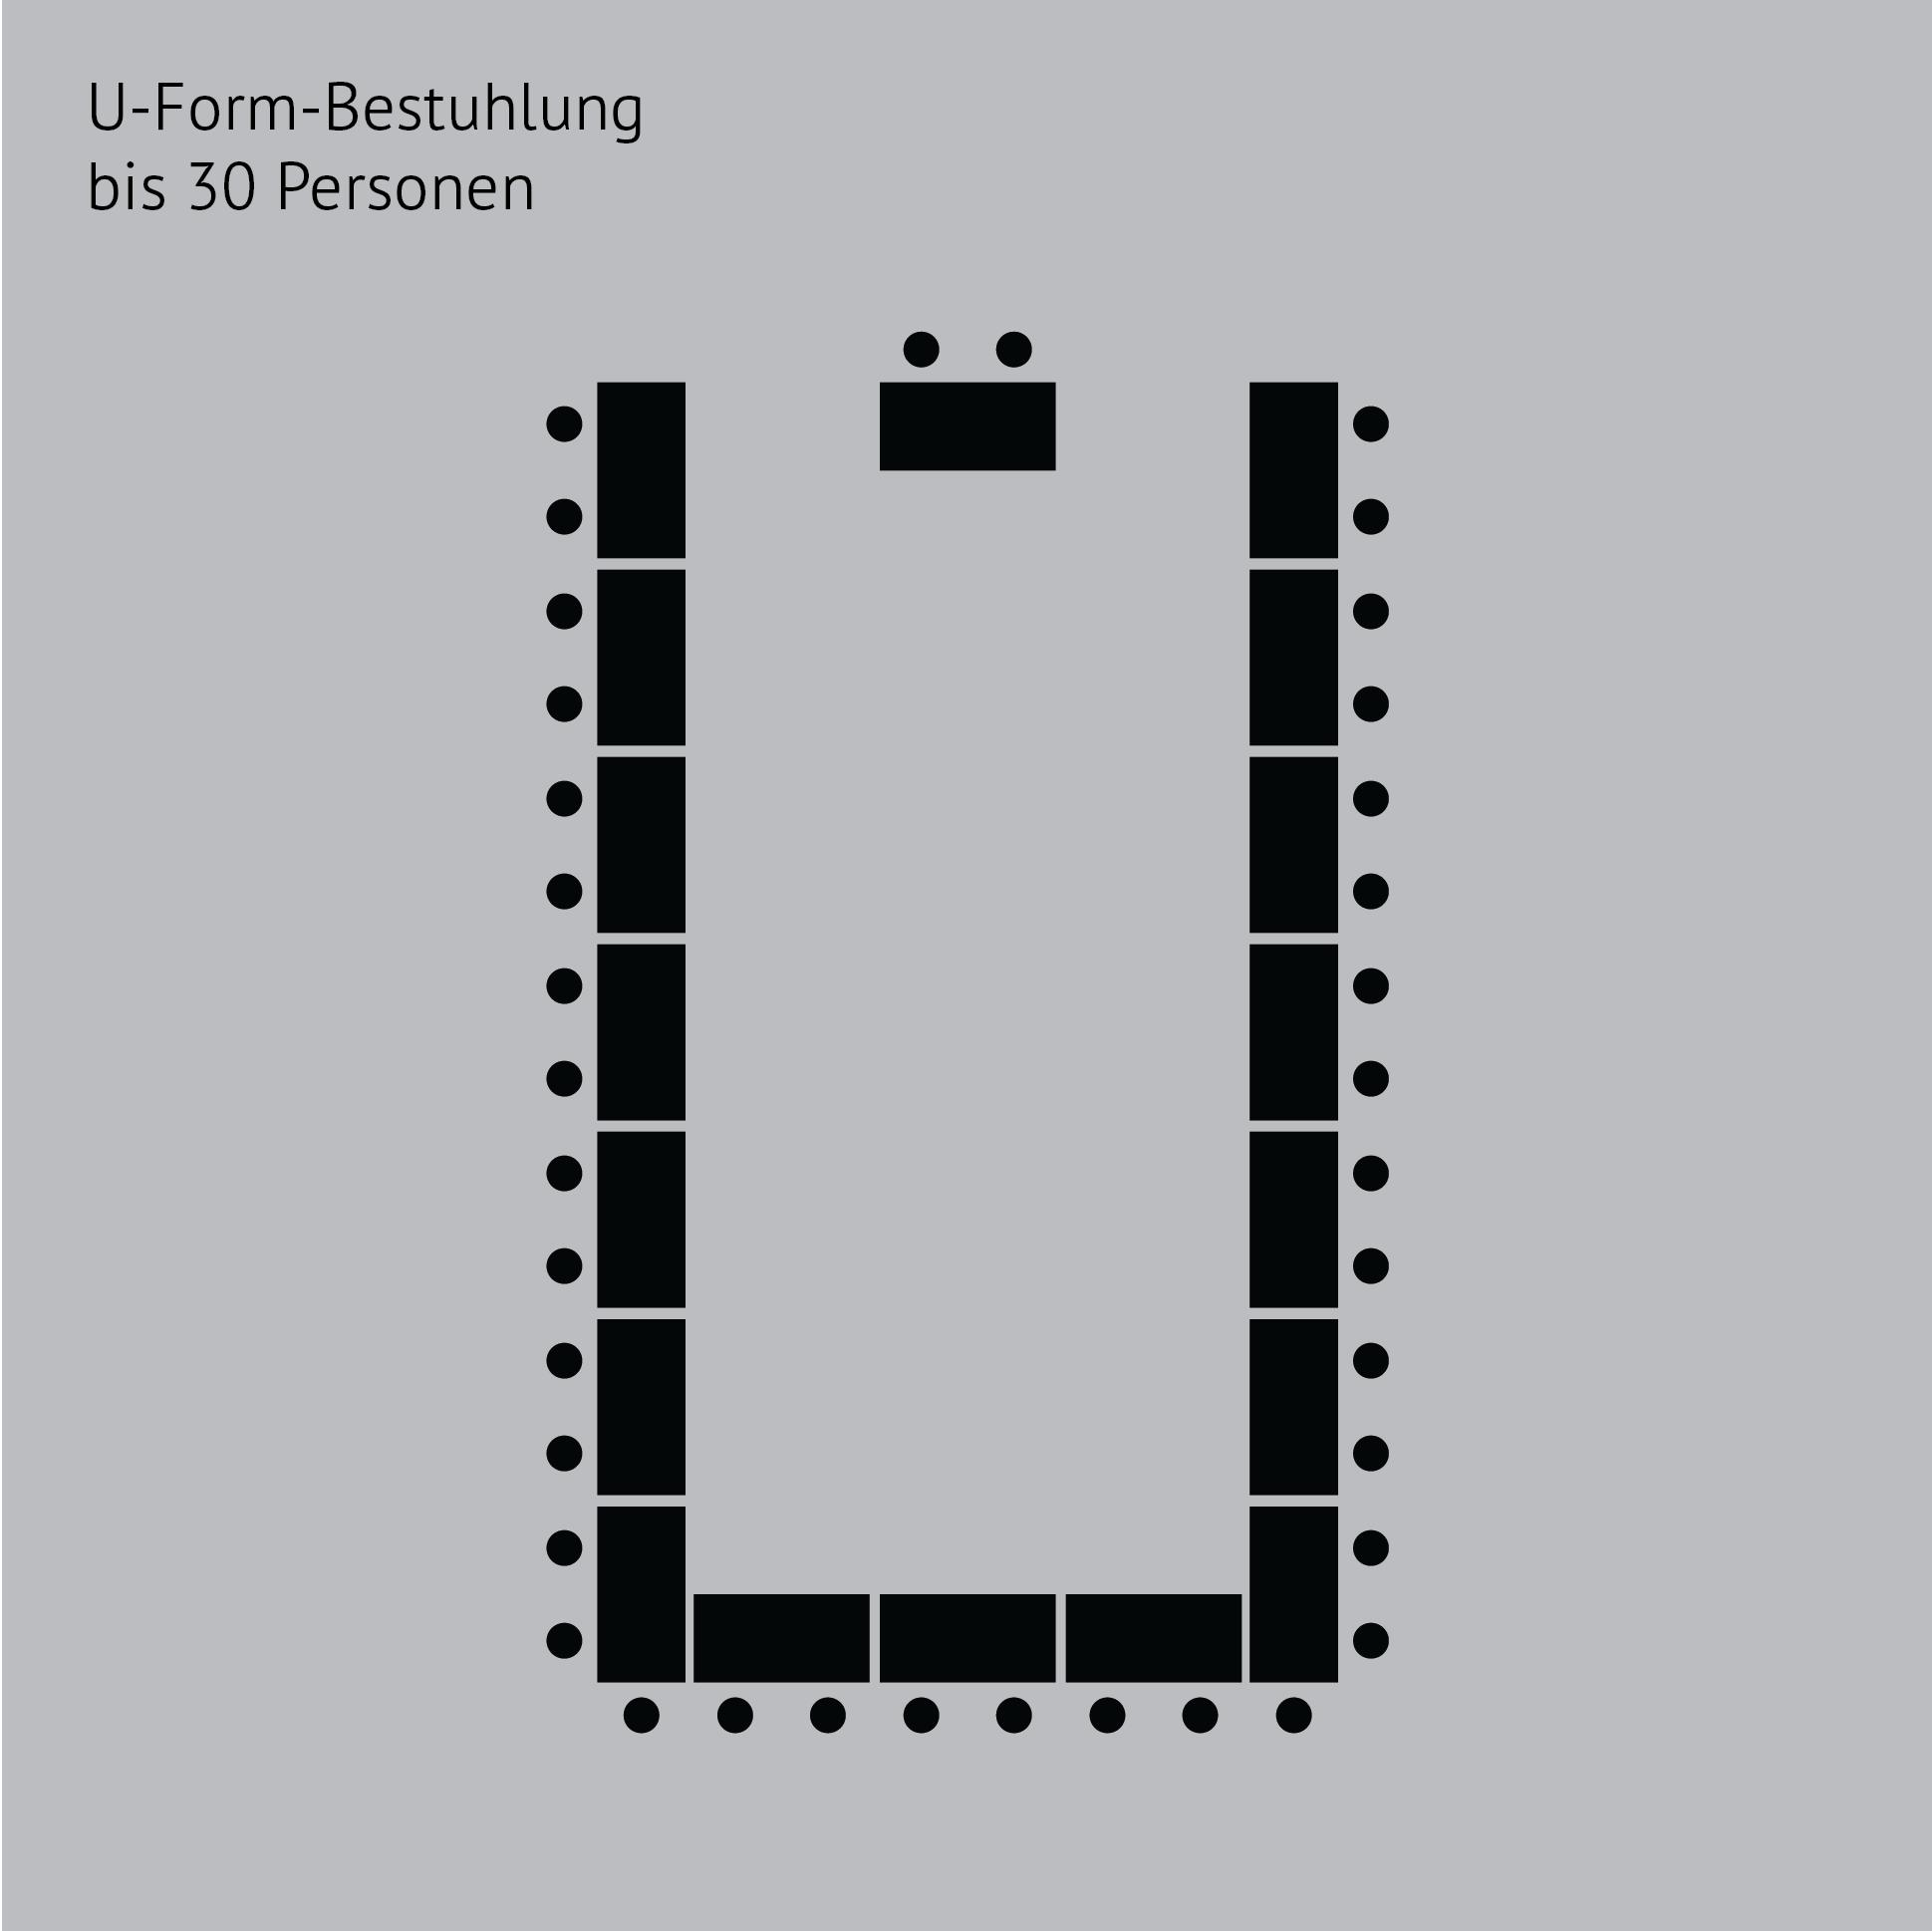 Seminarraum_Faehnern_465x465px_U-Form